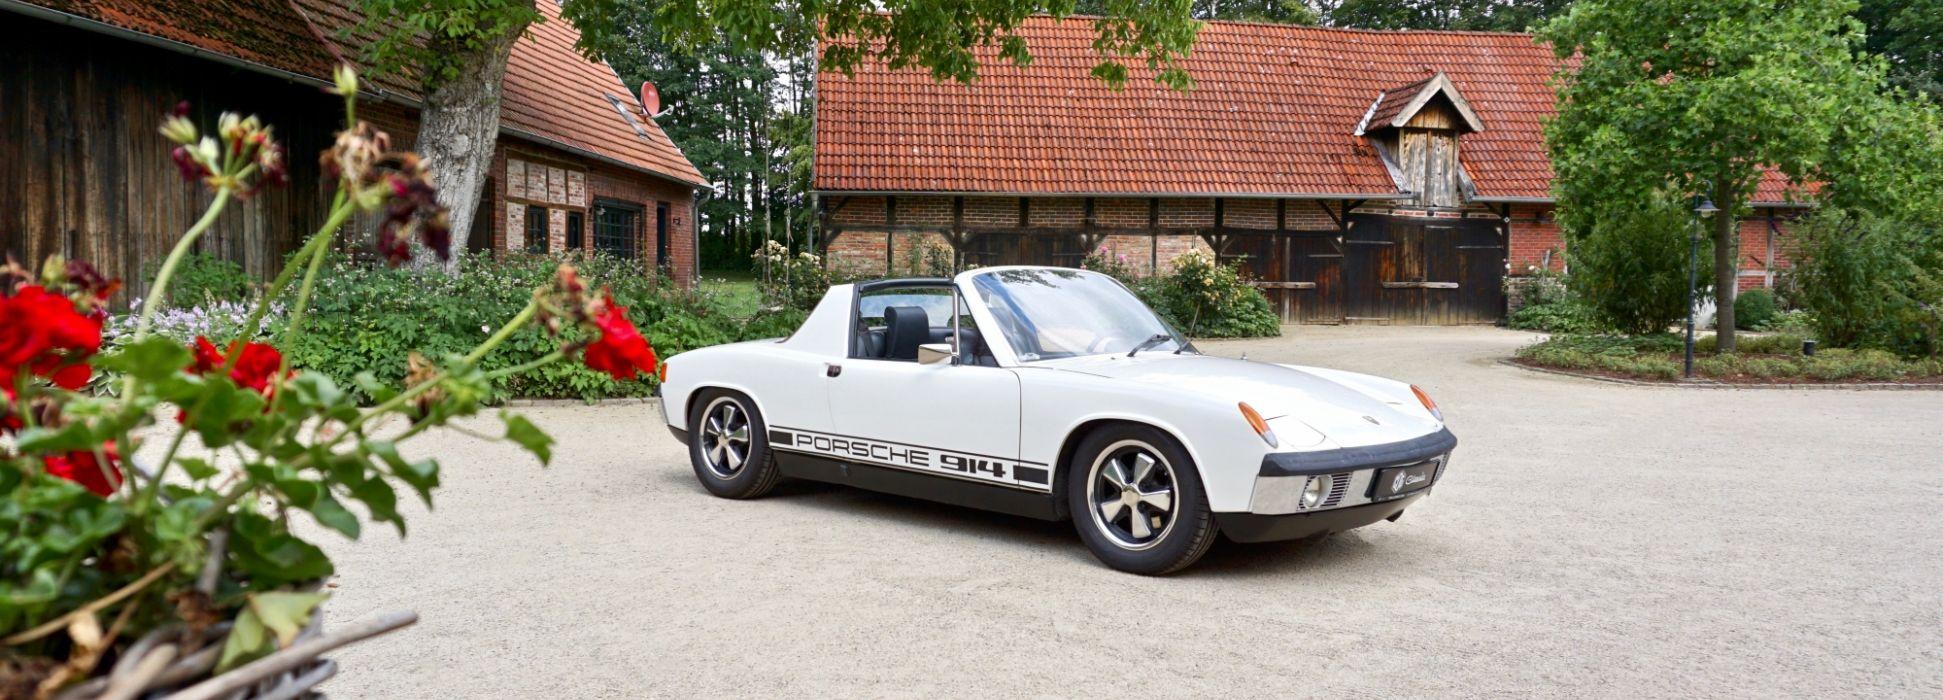 VW-Porsche 914 2.0 / 47 11